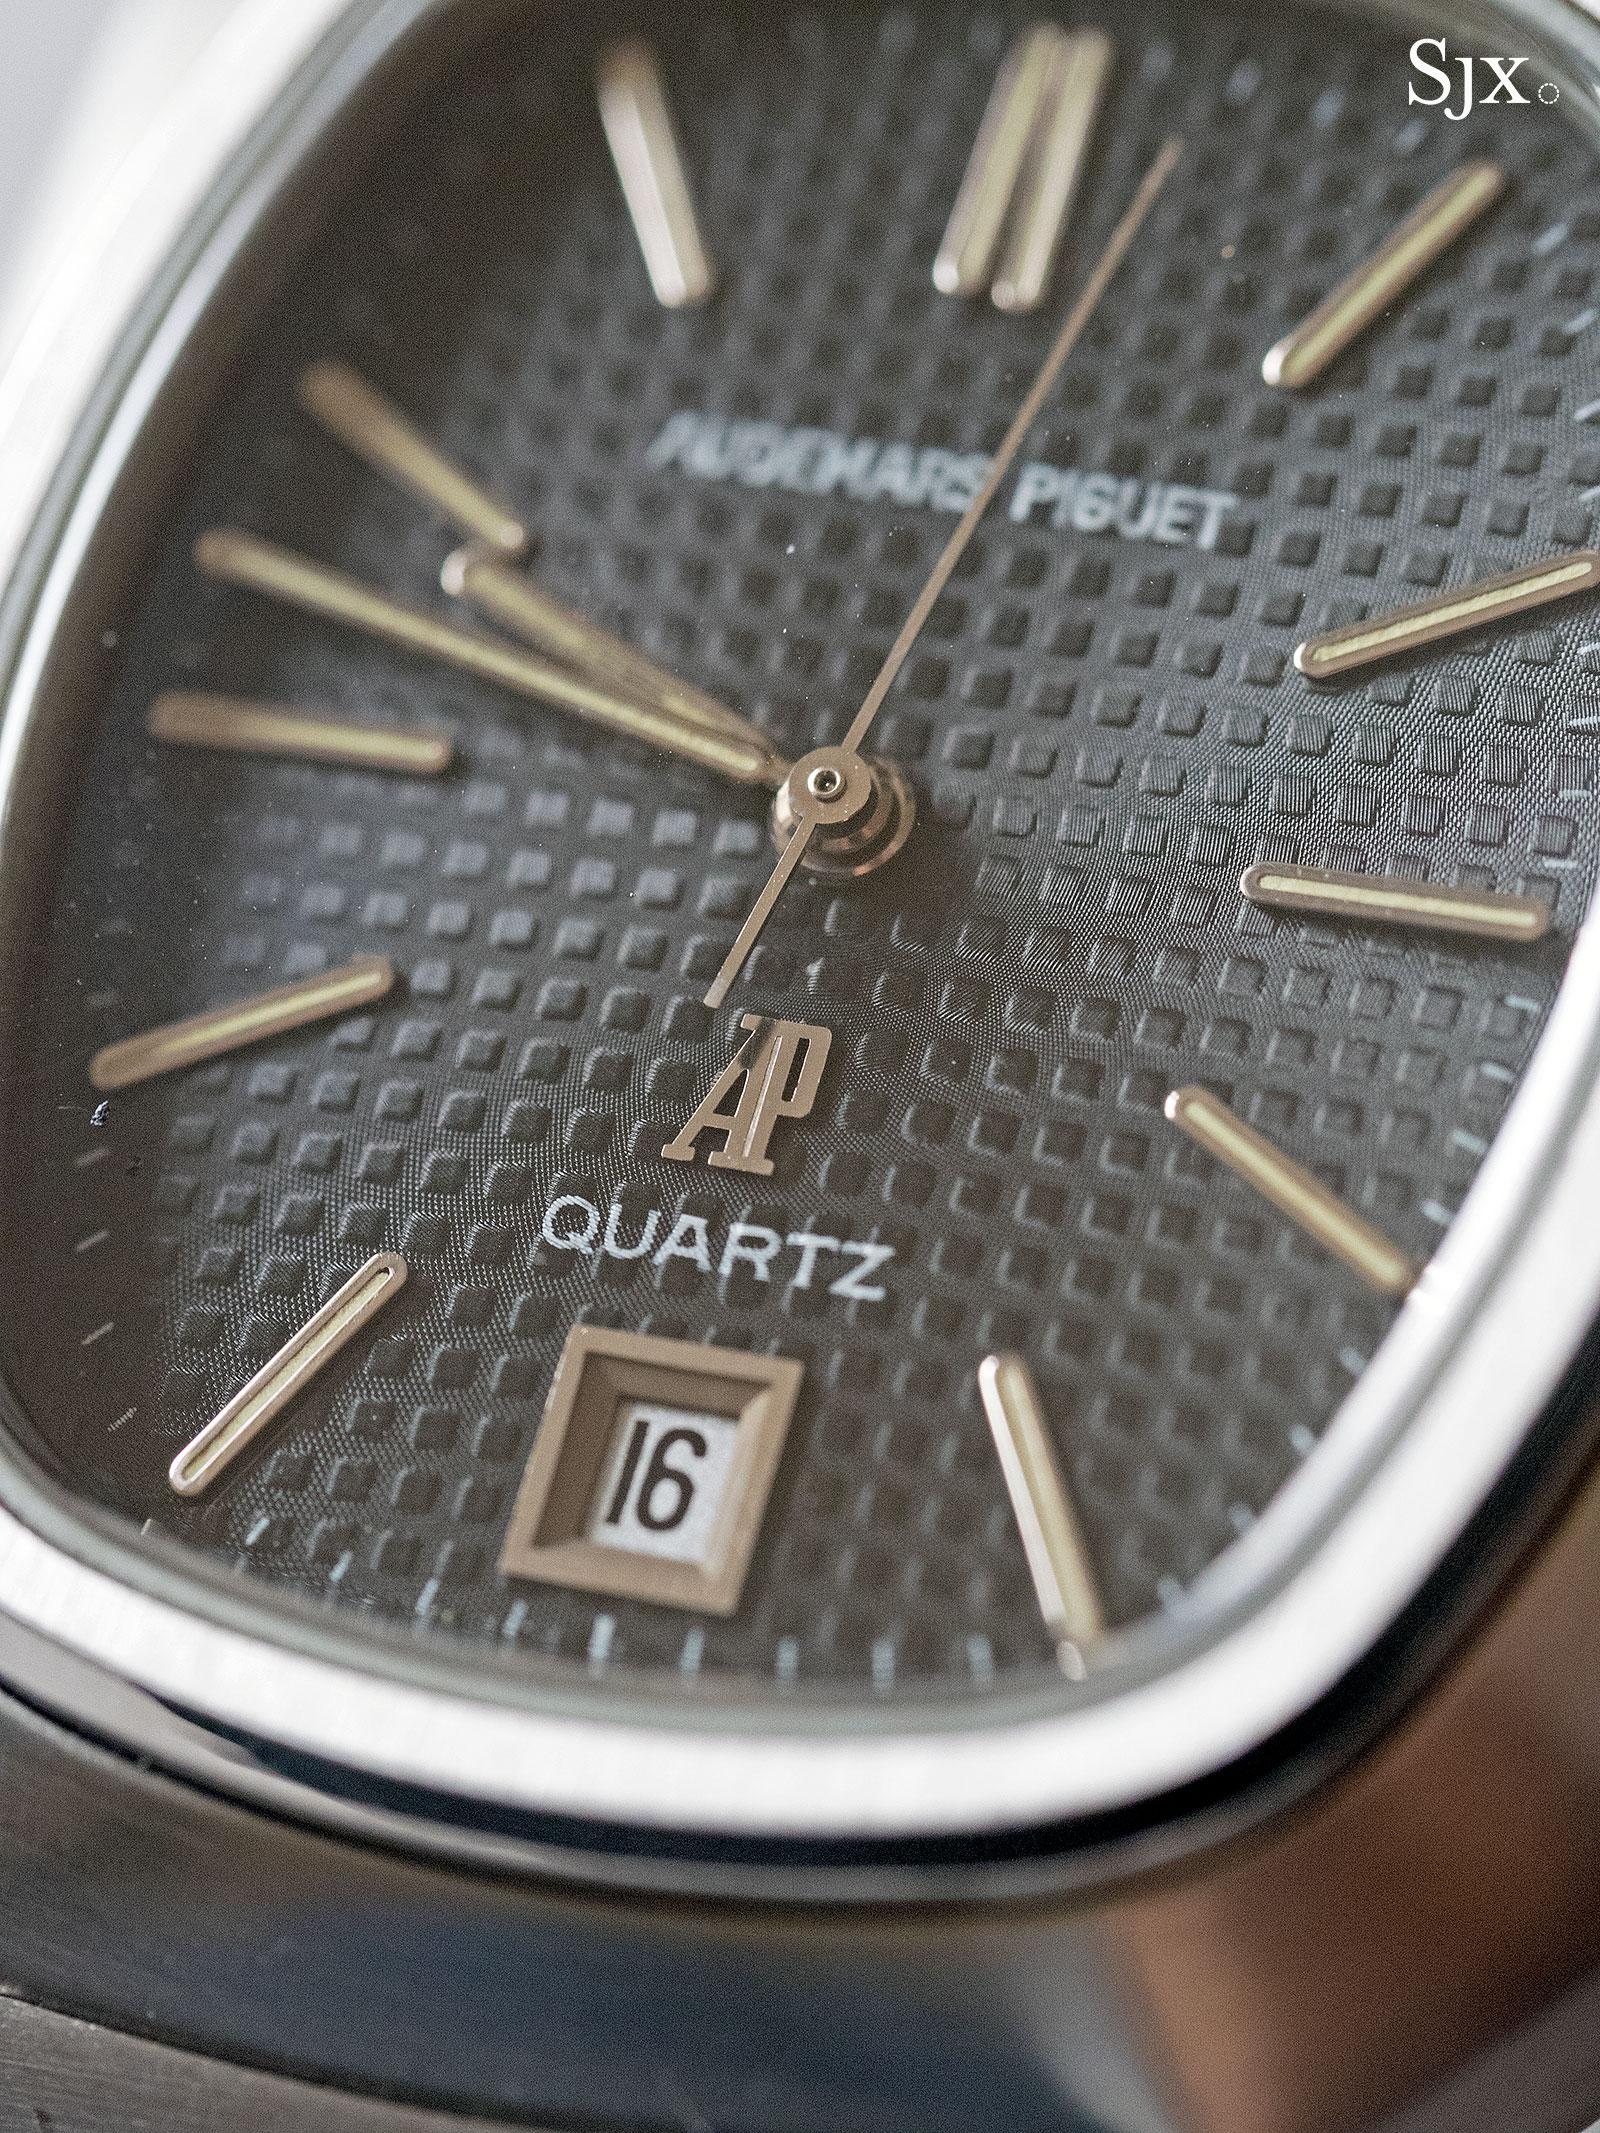 Audemars Piguet 6001 quartz 2